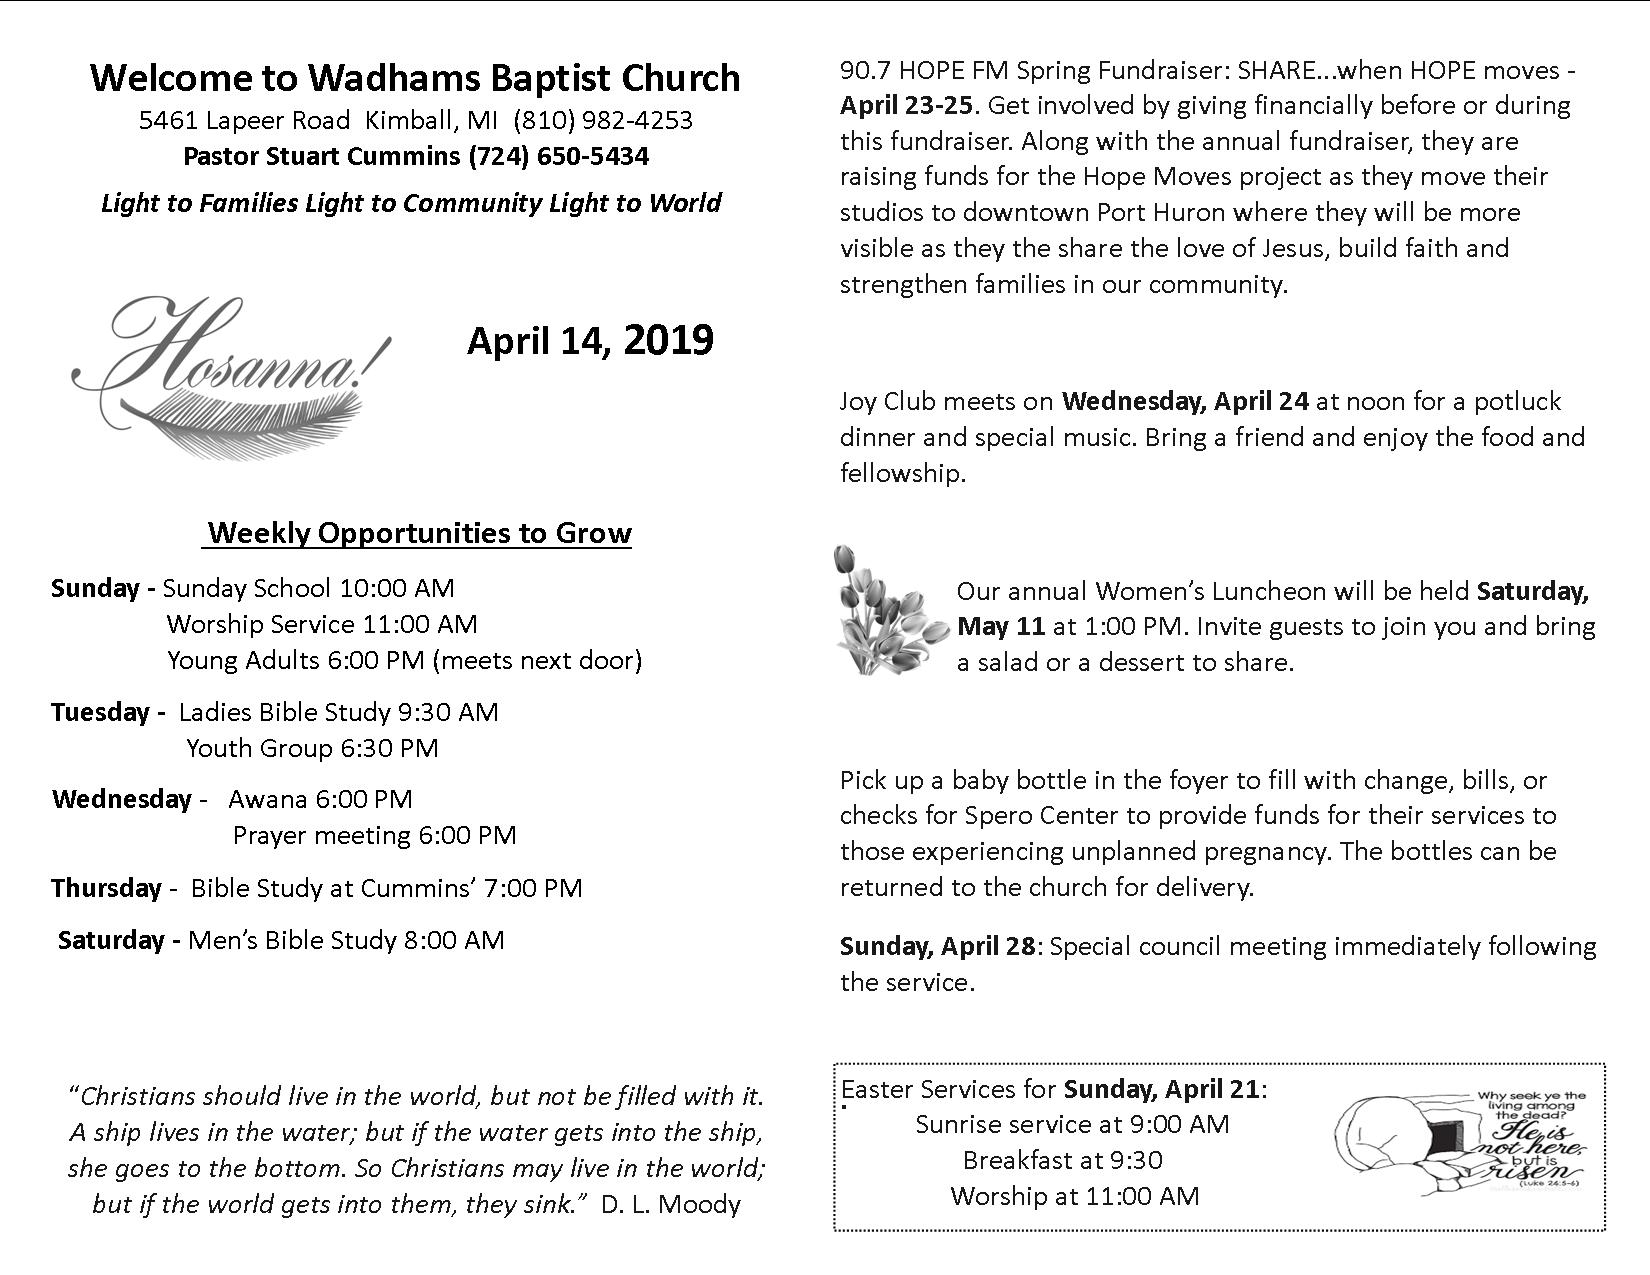 Bulletin April 14, 2019 - Wadhams Baptist Church